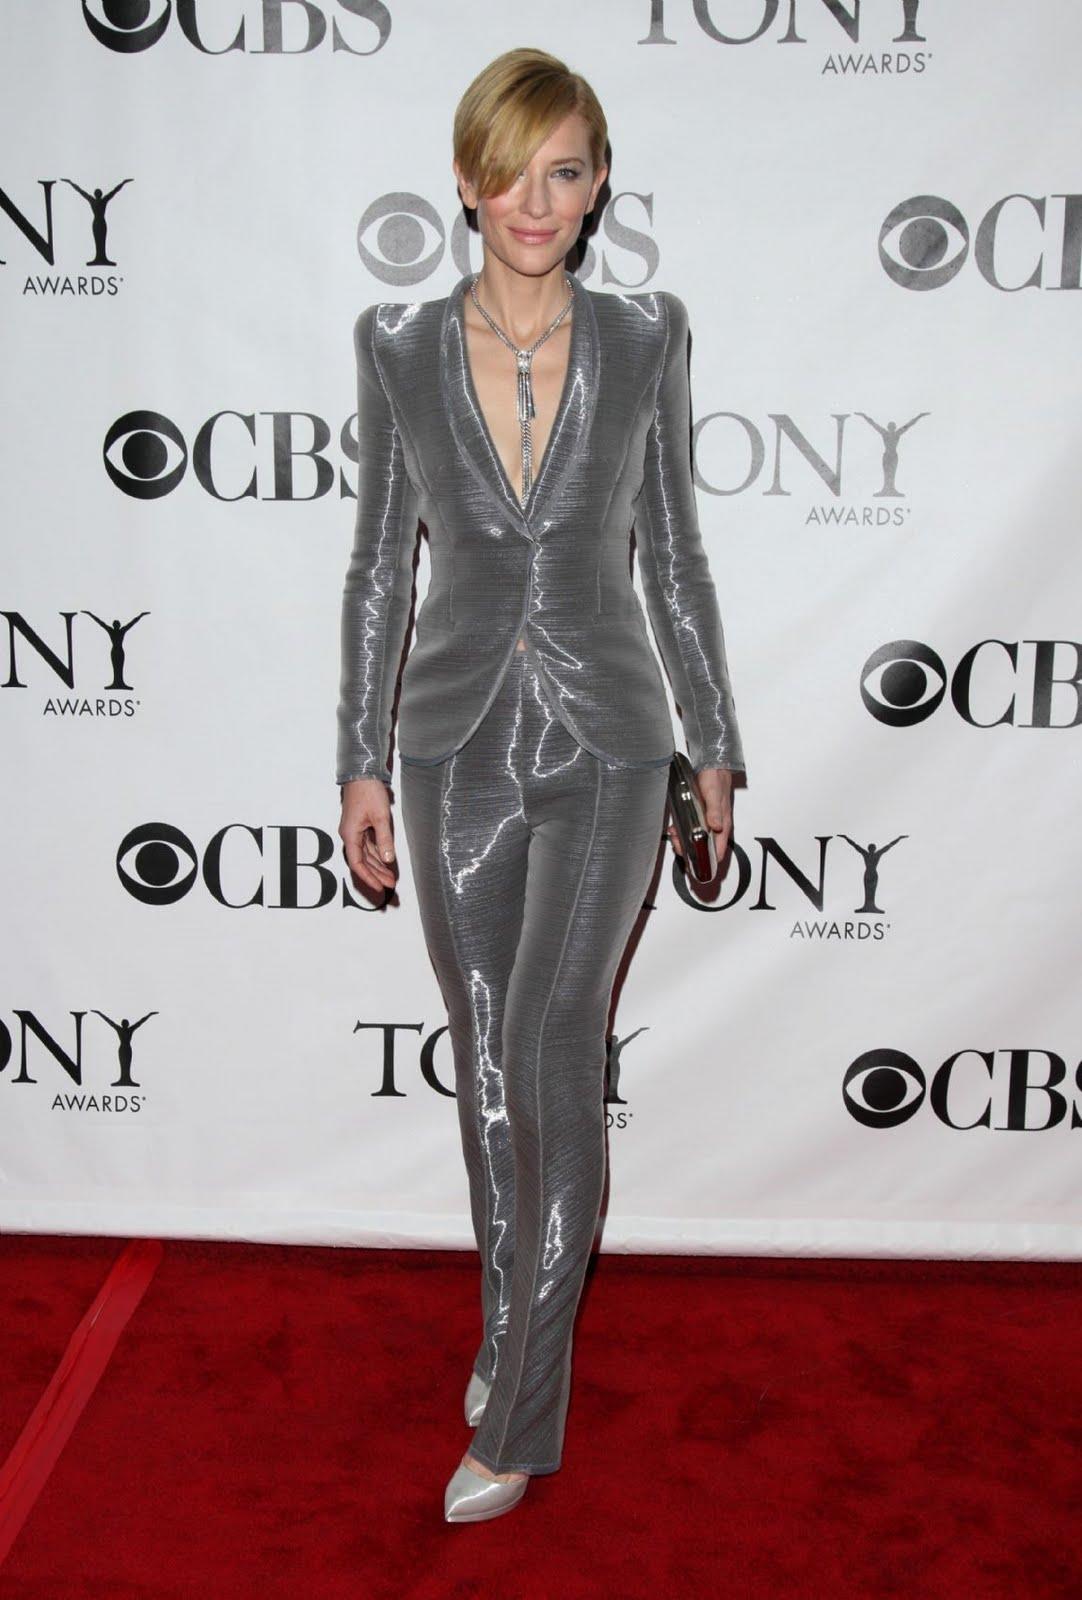 http://3.bp.blogspot.com/_Boiy80lCib8/TFdn9GdVosI/AAAAAAAAAcY/sLPhSs1Bl48/s1600/Cate+Blanchett+-+Armani+Priv%C3%A9+10.jpg